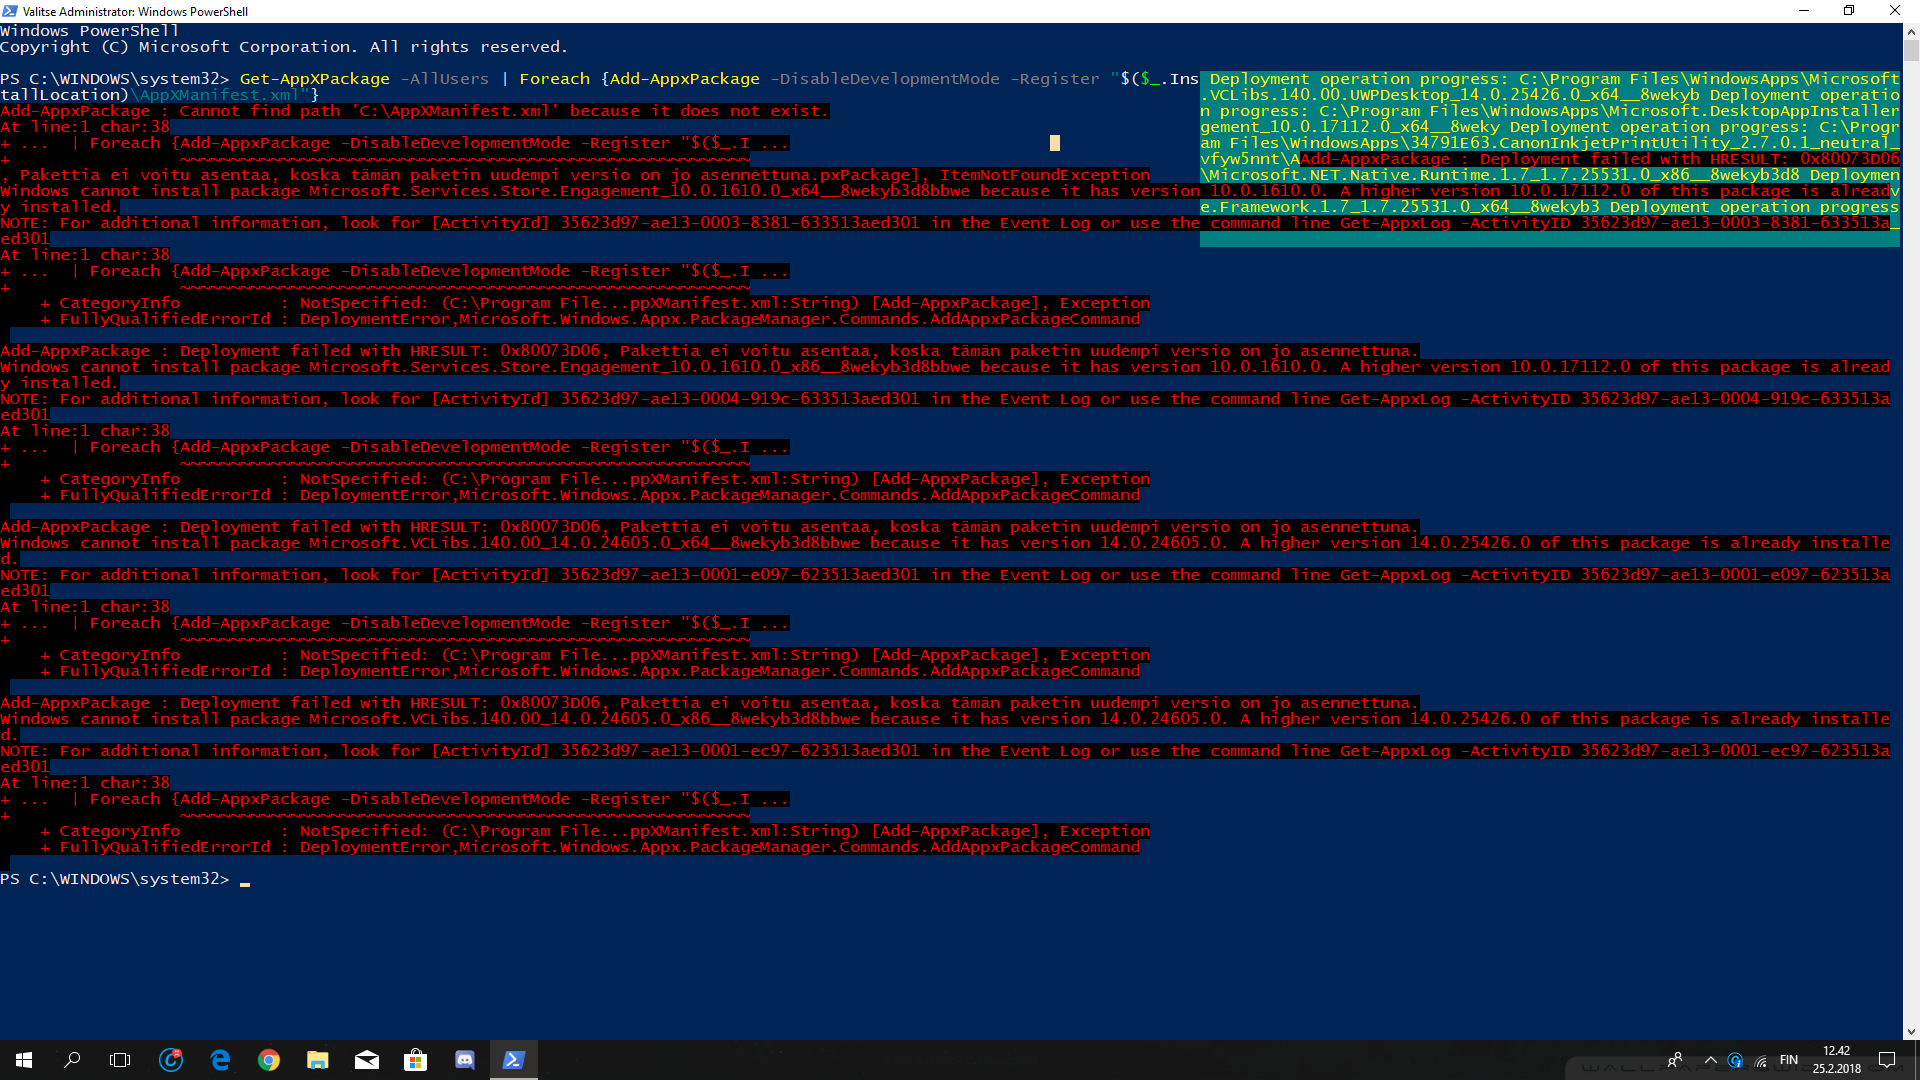 Desktop Screenshot 2018.02.25 - 12.42.08.73.